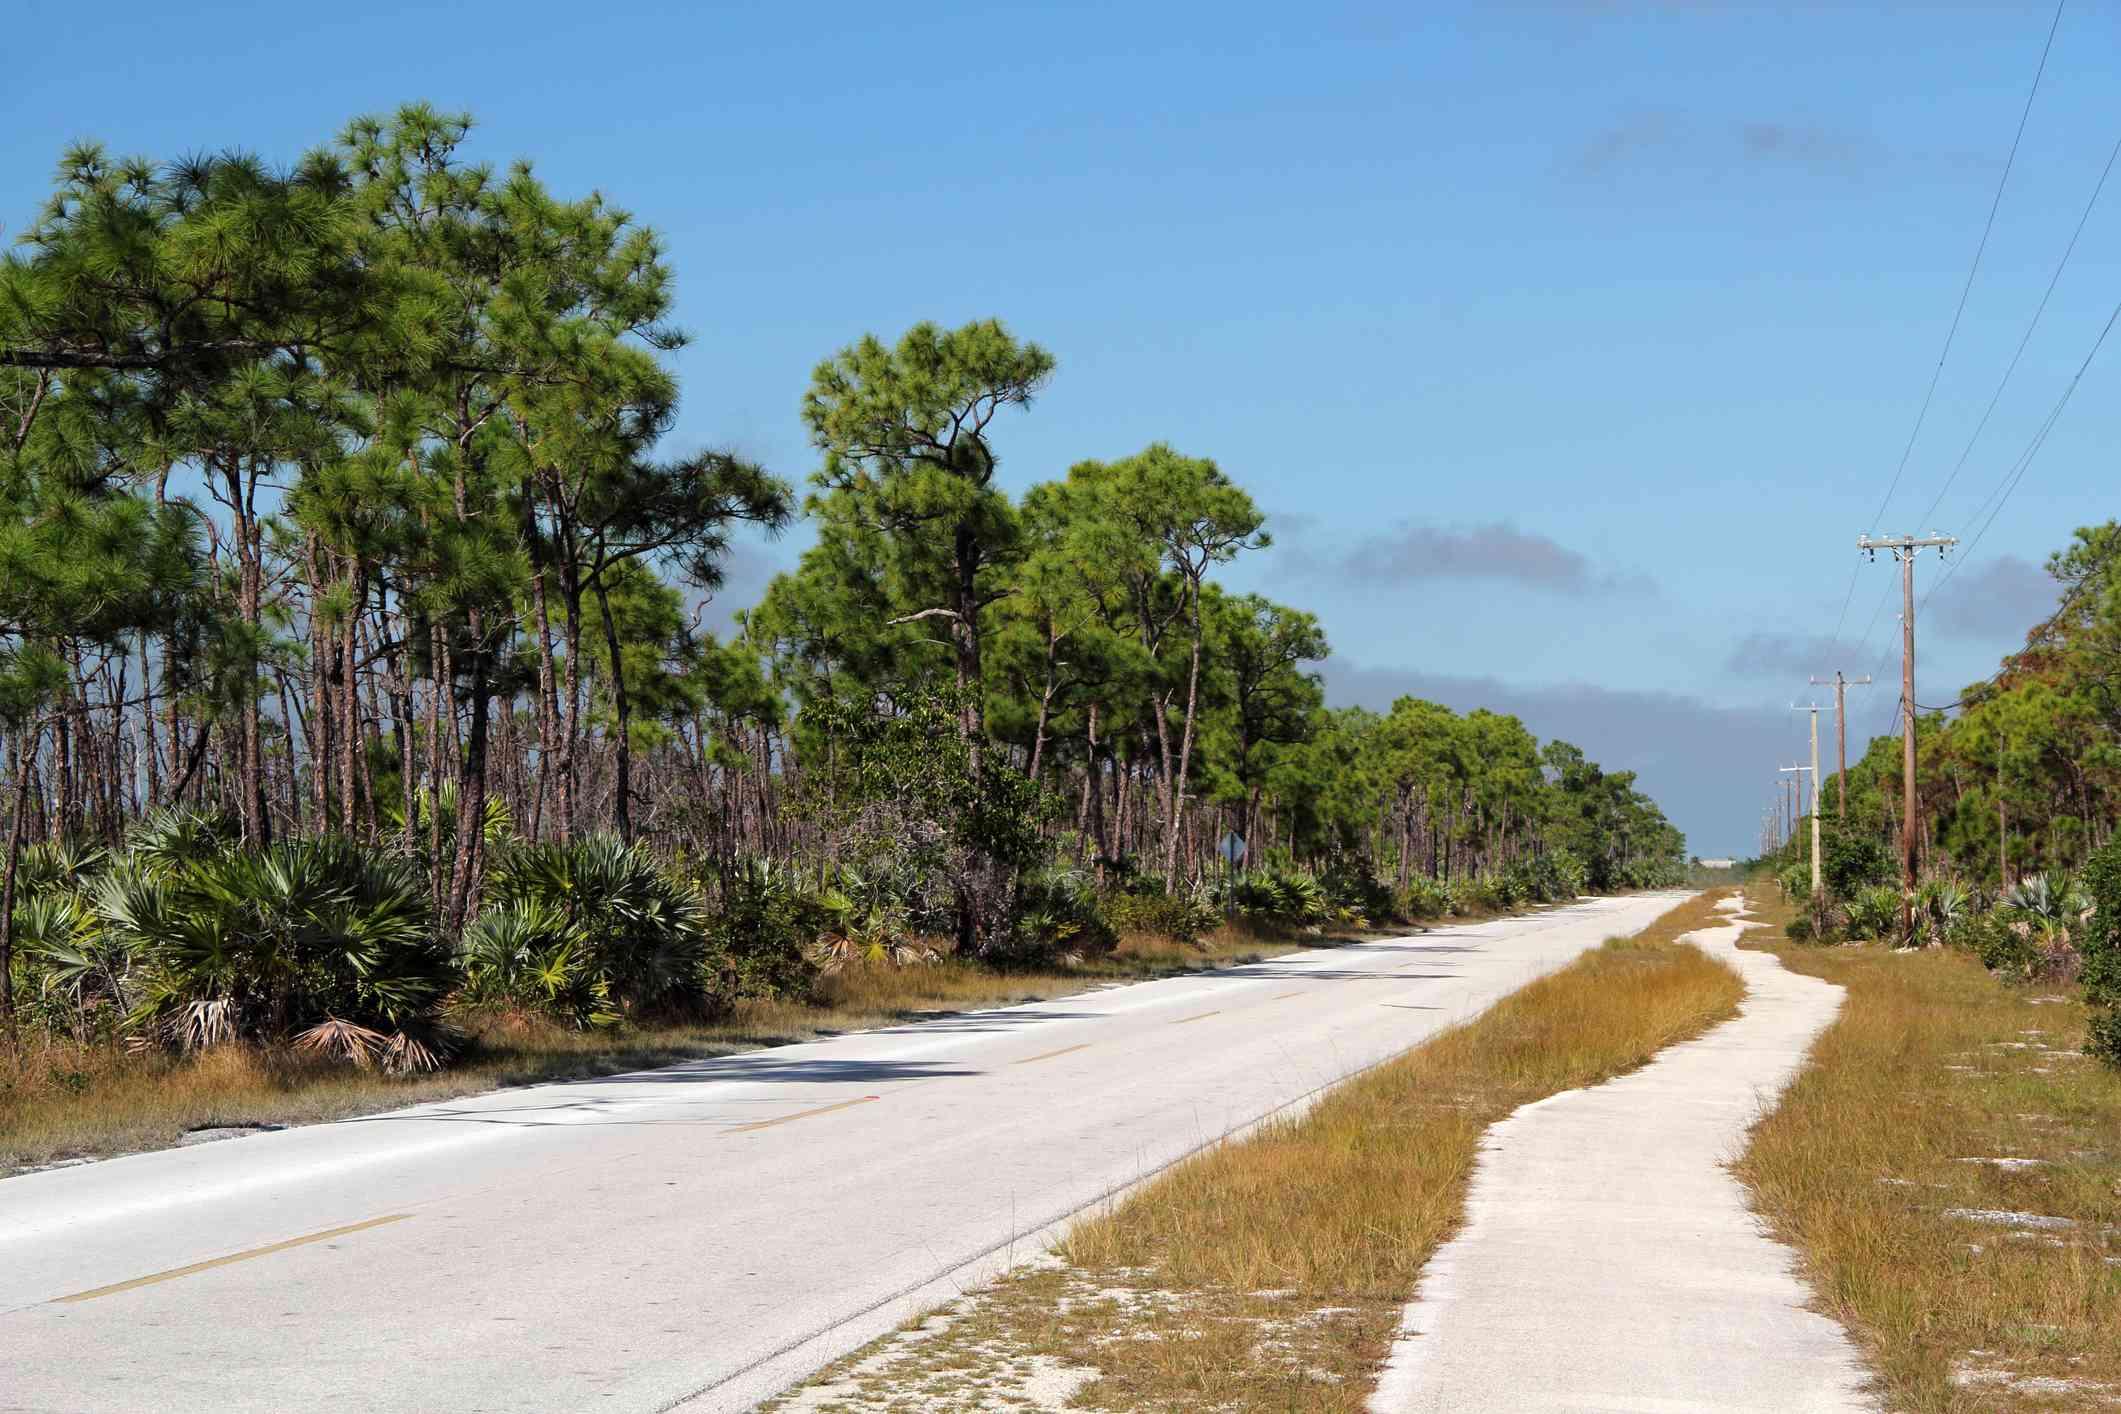 Road and walking path running through Key Deer Wildlife Refuge